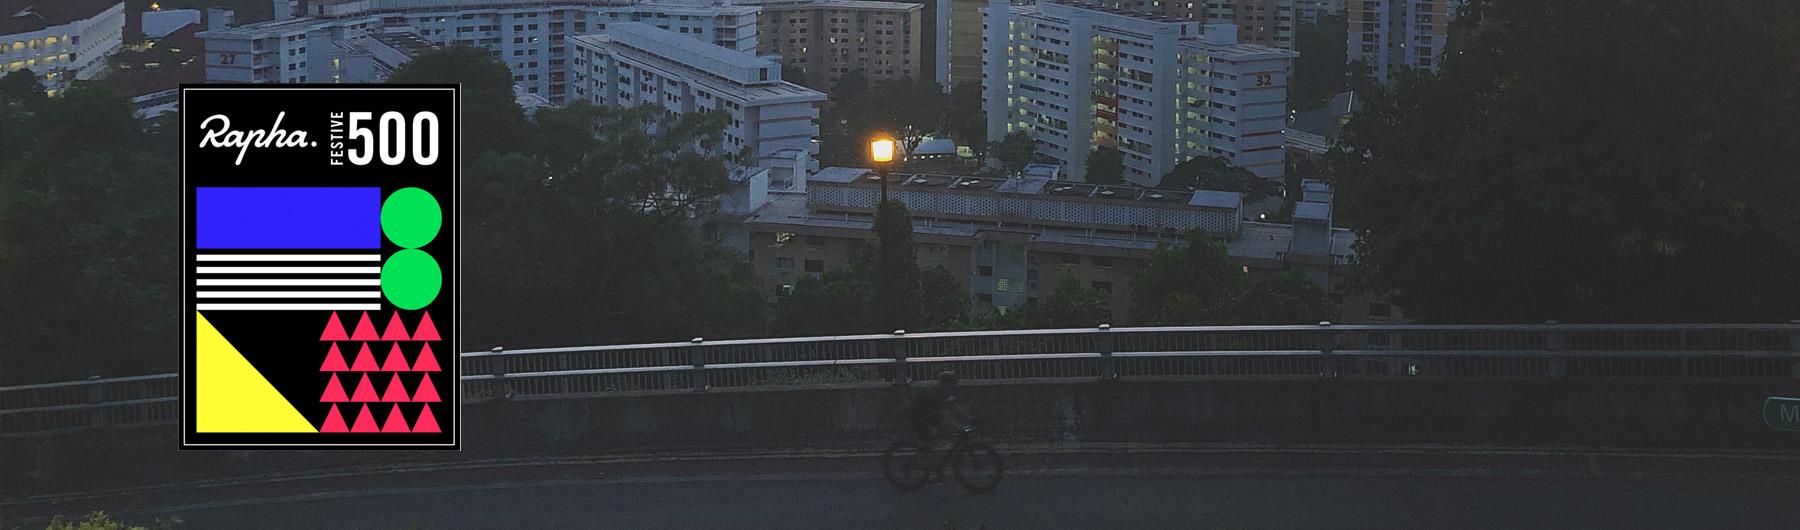 Rapha Singapore Festive 500 Ride 3 | 6.30am, Thursday 27th December | Athlete Lab